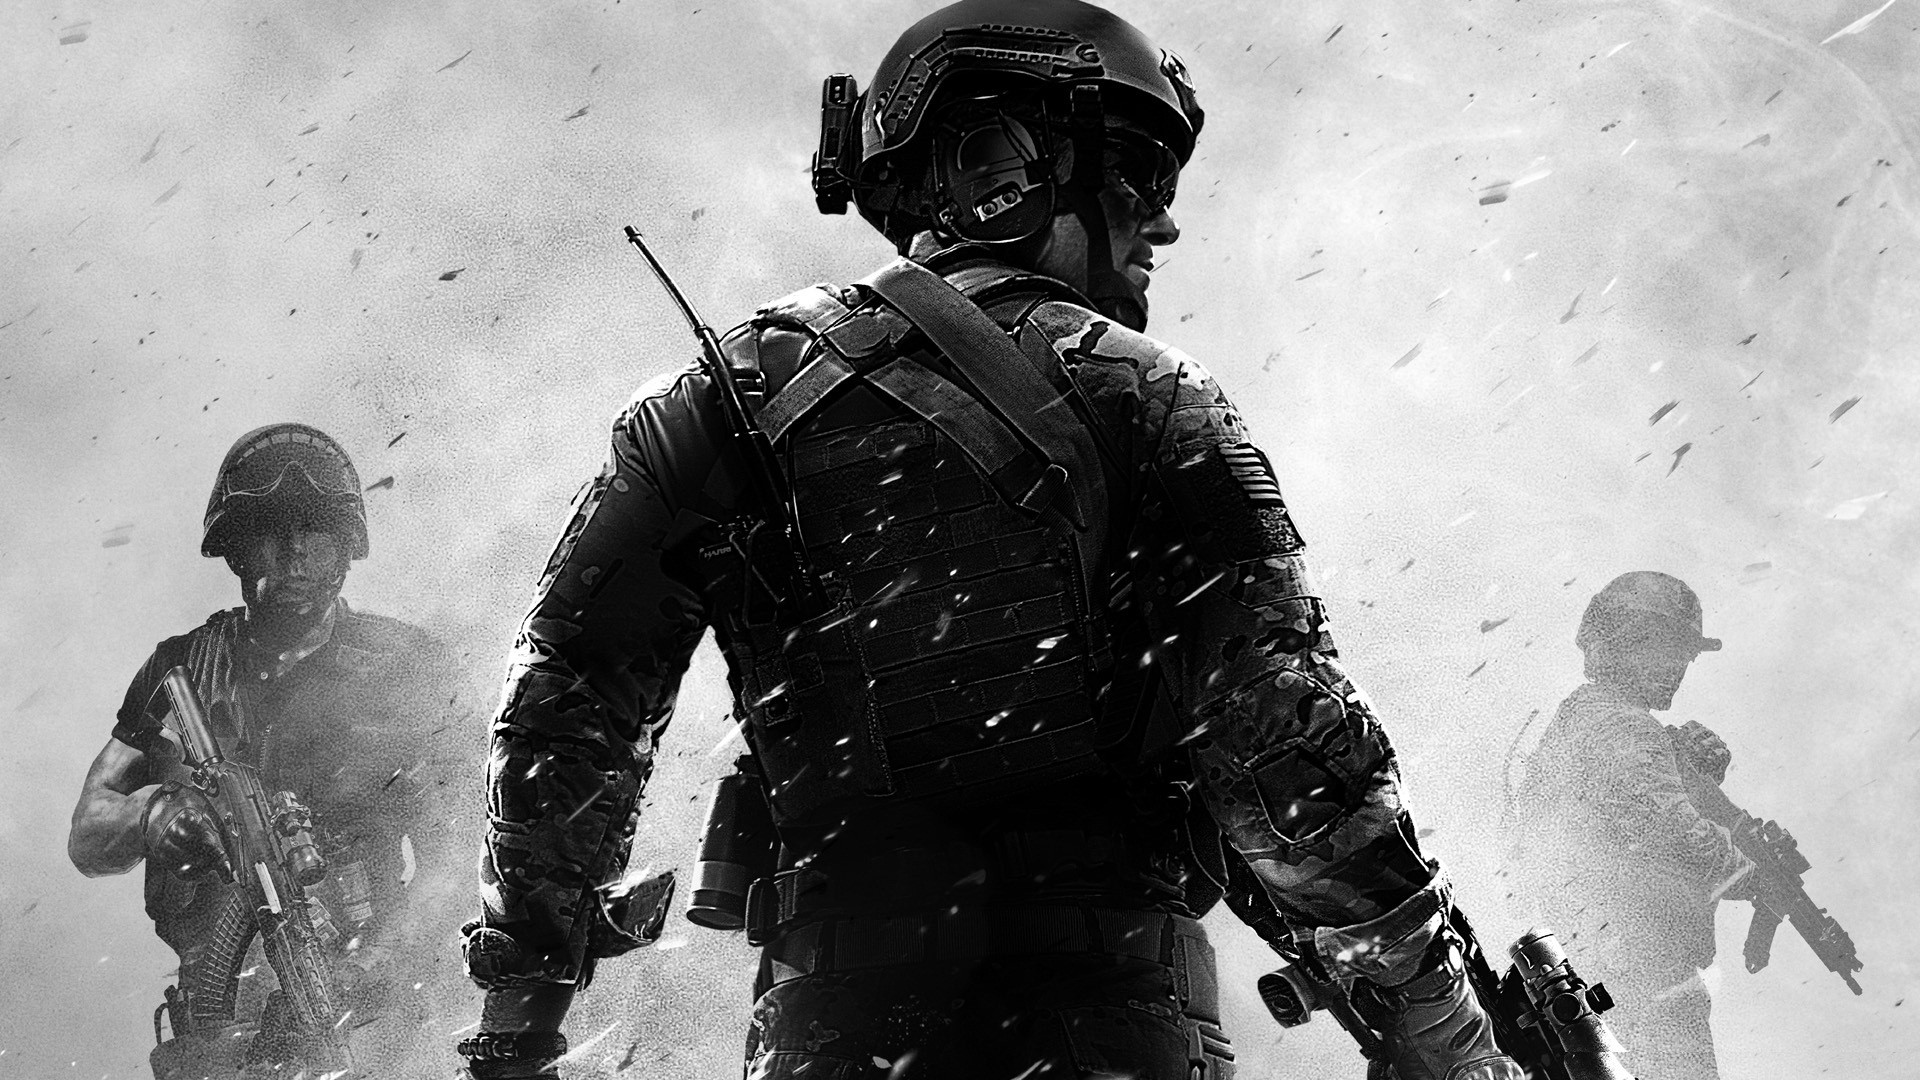 Call of duty hd wallpaper background image 1920x1080 - Call of duty warfare wallpaper ...